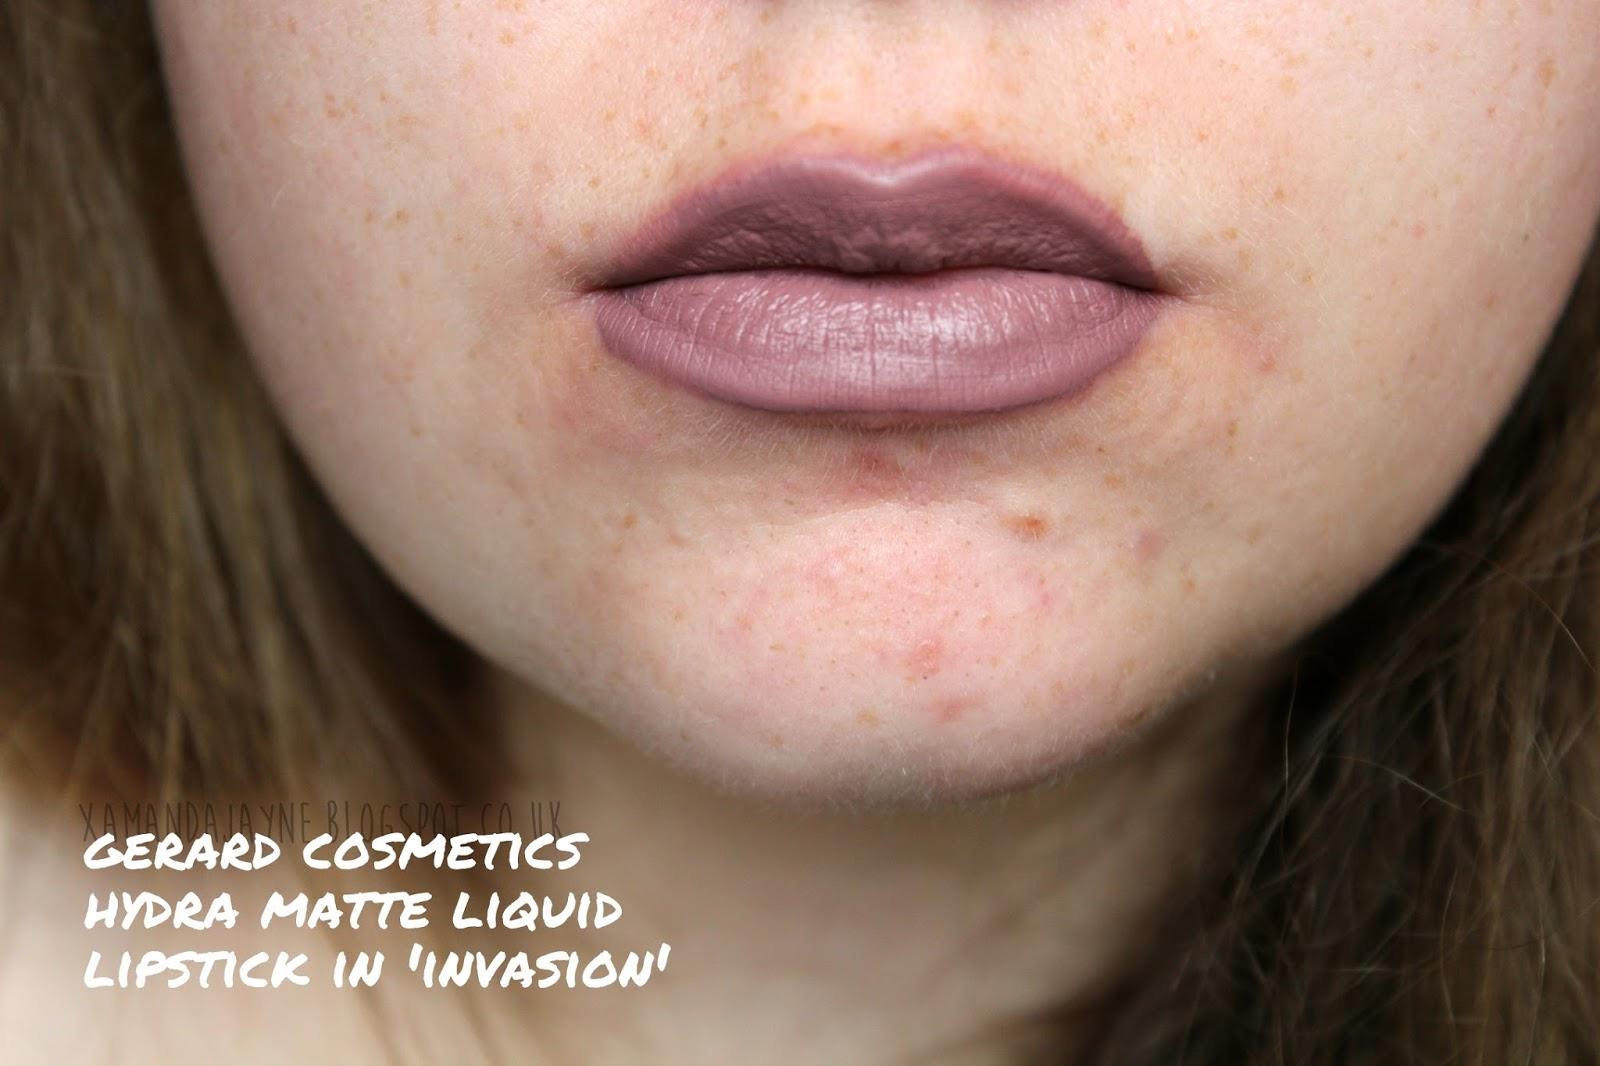 gerard cosmetics hydra matte liquid lipstick invasion dupe, primark kendall super matte liquid lipstick, review, swatches, hydra matte dupe, gerard cosmetics dupe